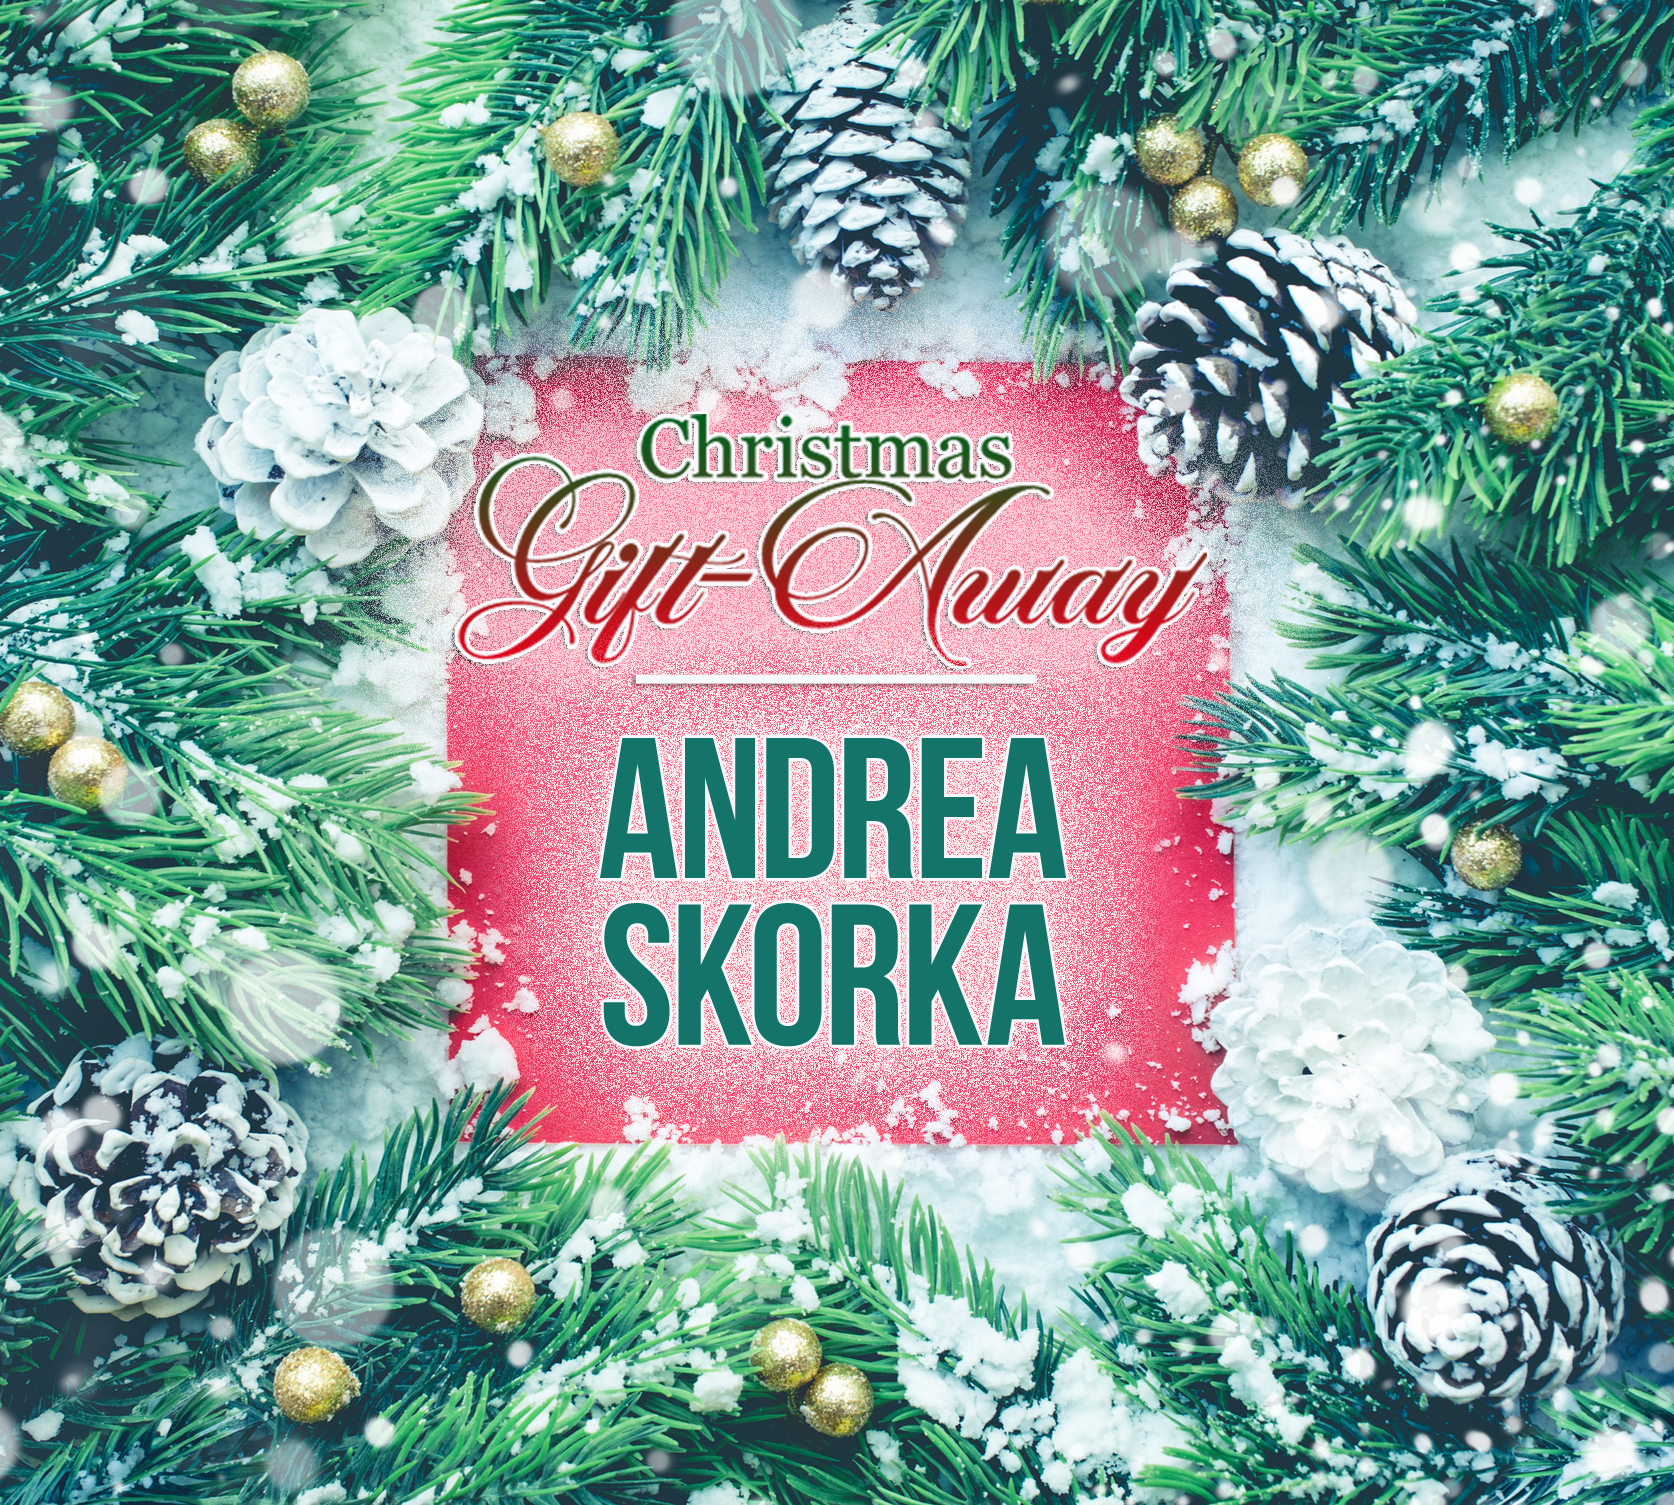 Christmas Gift Away Recipient #4 - Andrea Skorka